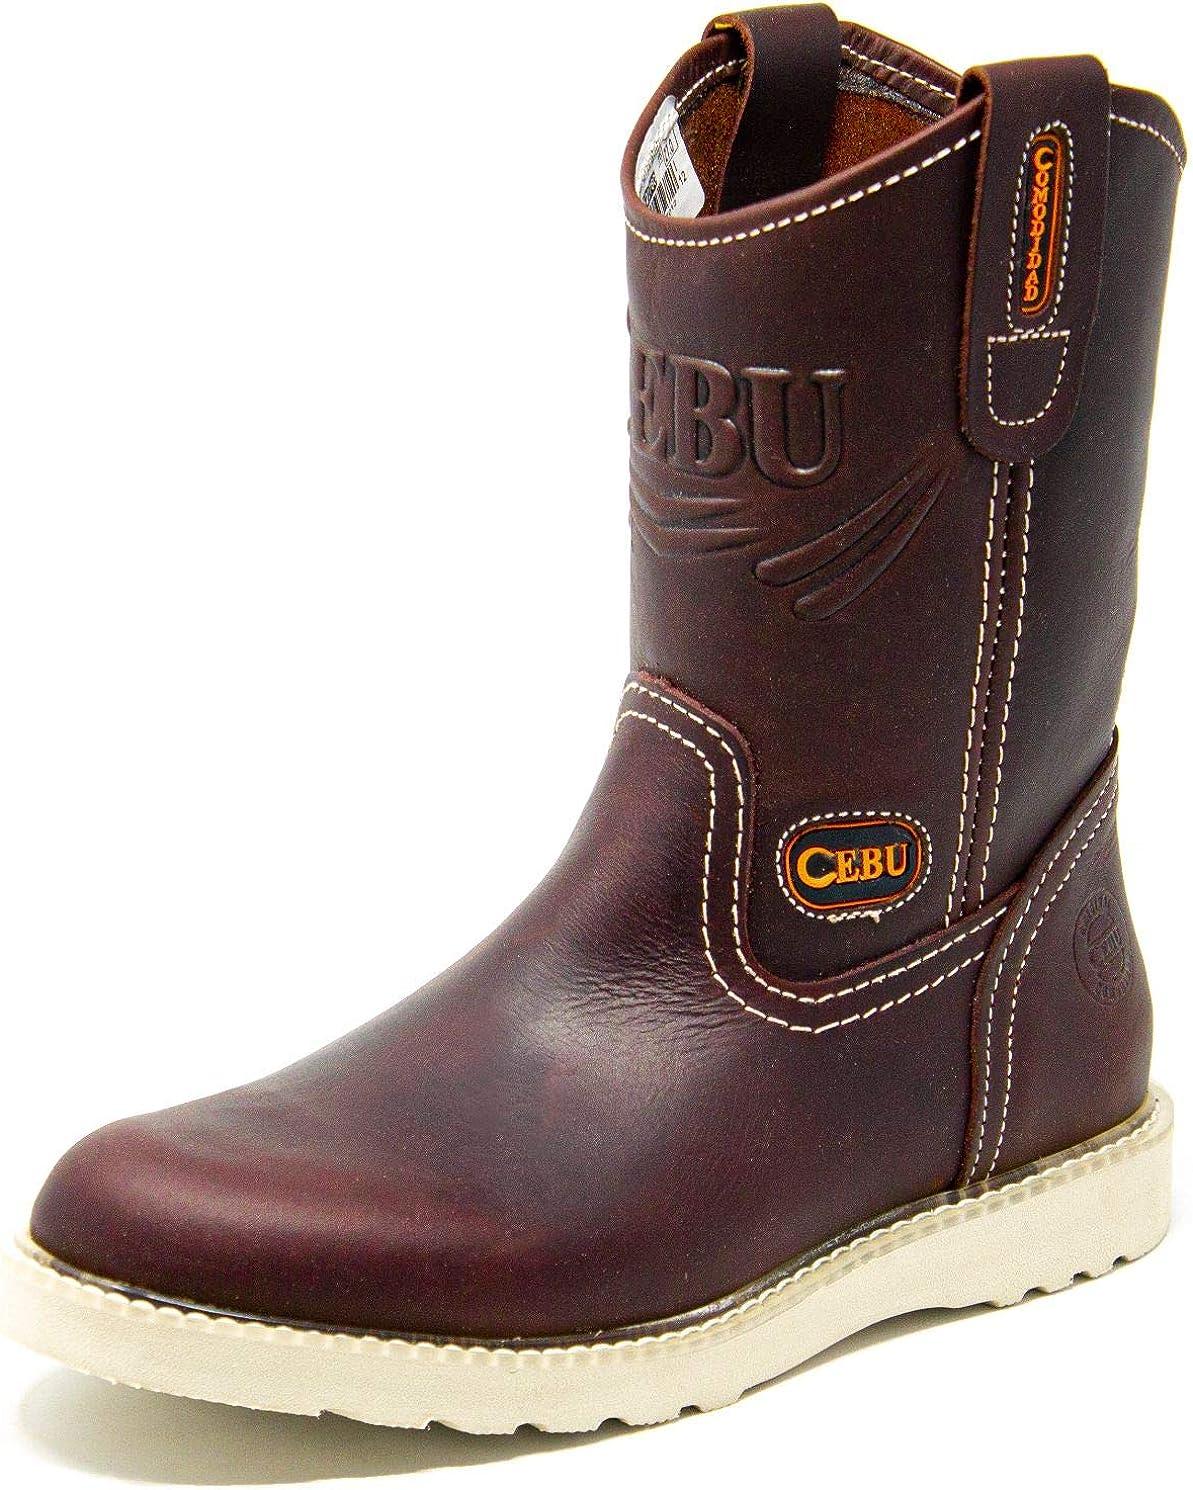 CEBU Soft Toe Work Boots for Men, Comfortable Ultra Lightweight, Wedge Sole, 10